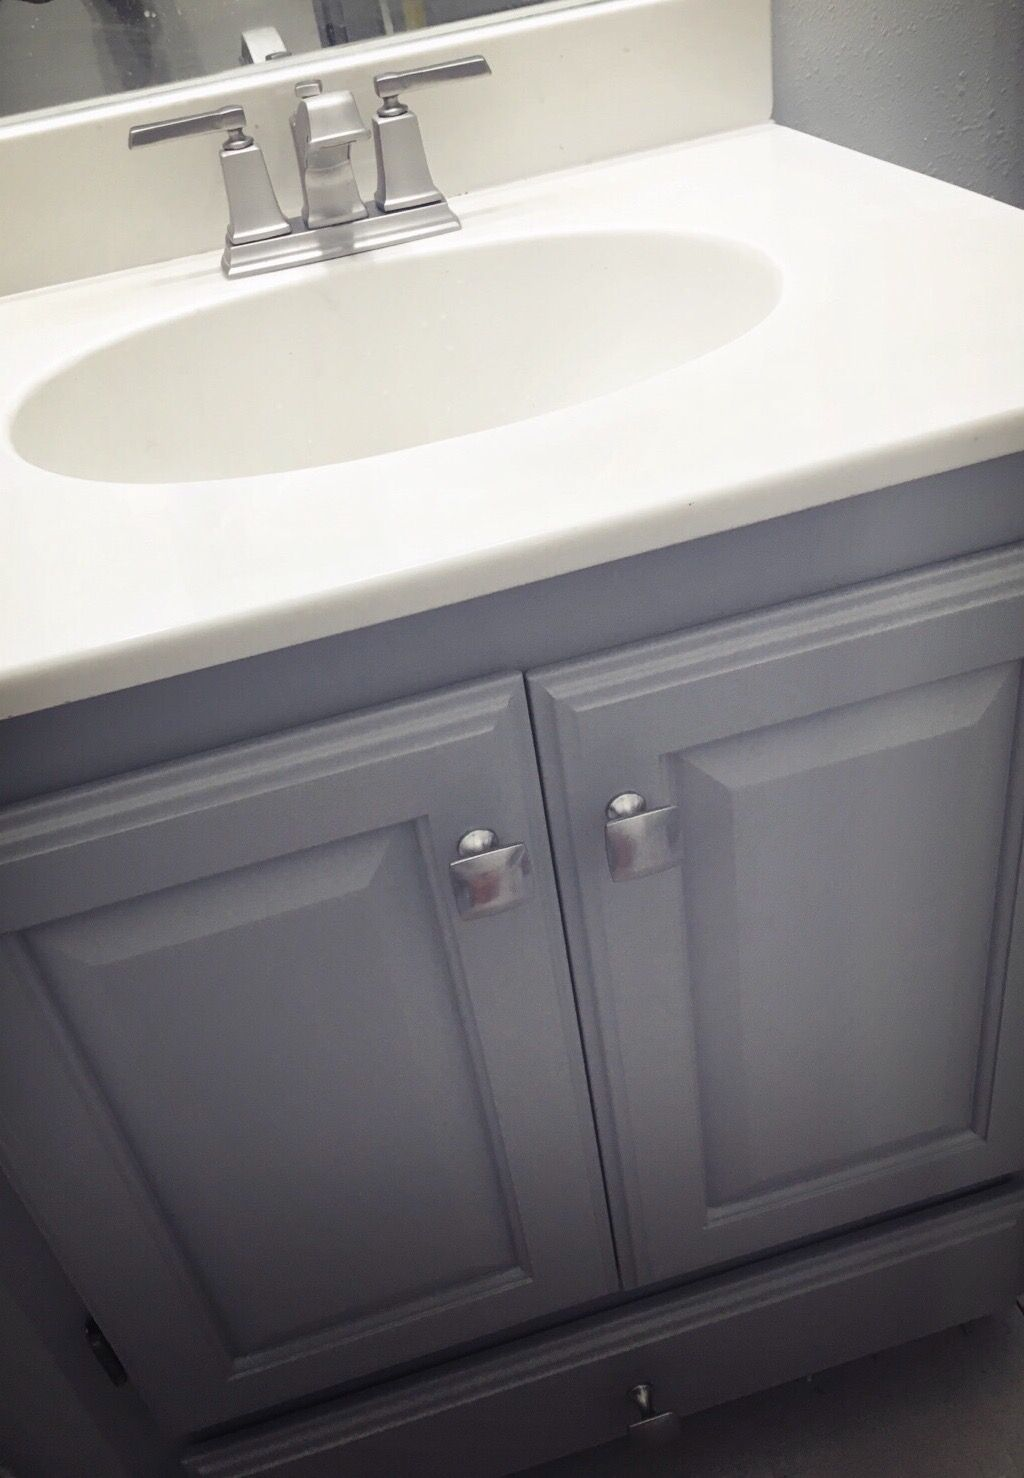 Bathroom Sink Update Dorian Grey Paint On Cabinets Moen - Moen boardwalk bathroom faucet for bathroom decor ideas